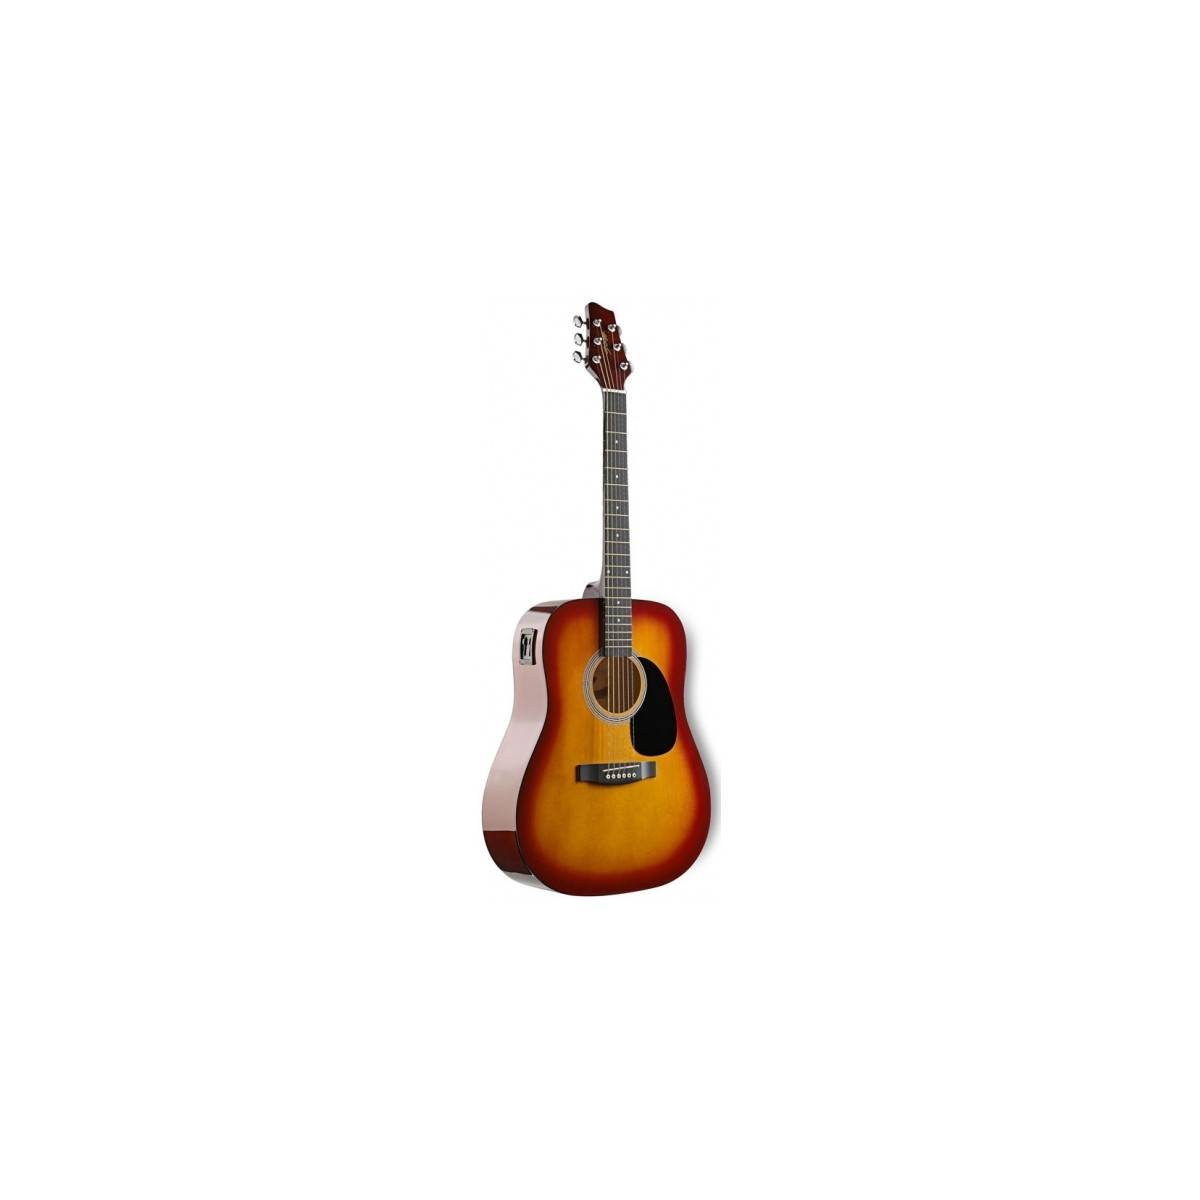 Guitare Folk Electroacoustique 4/4 Cherryburst